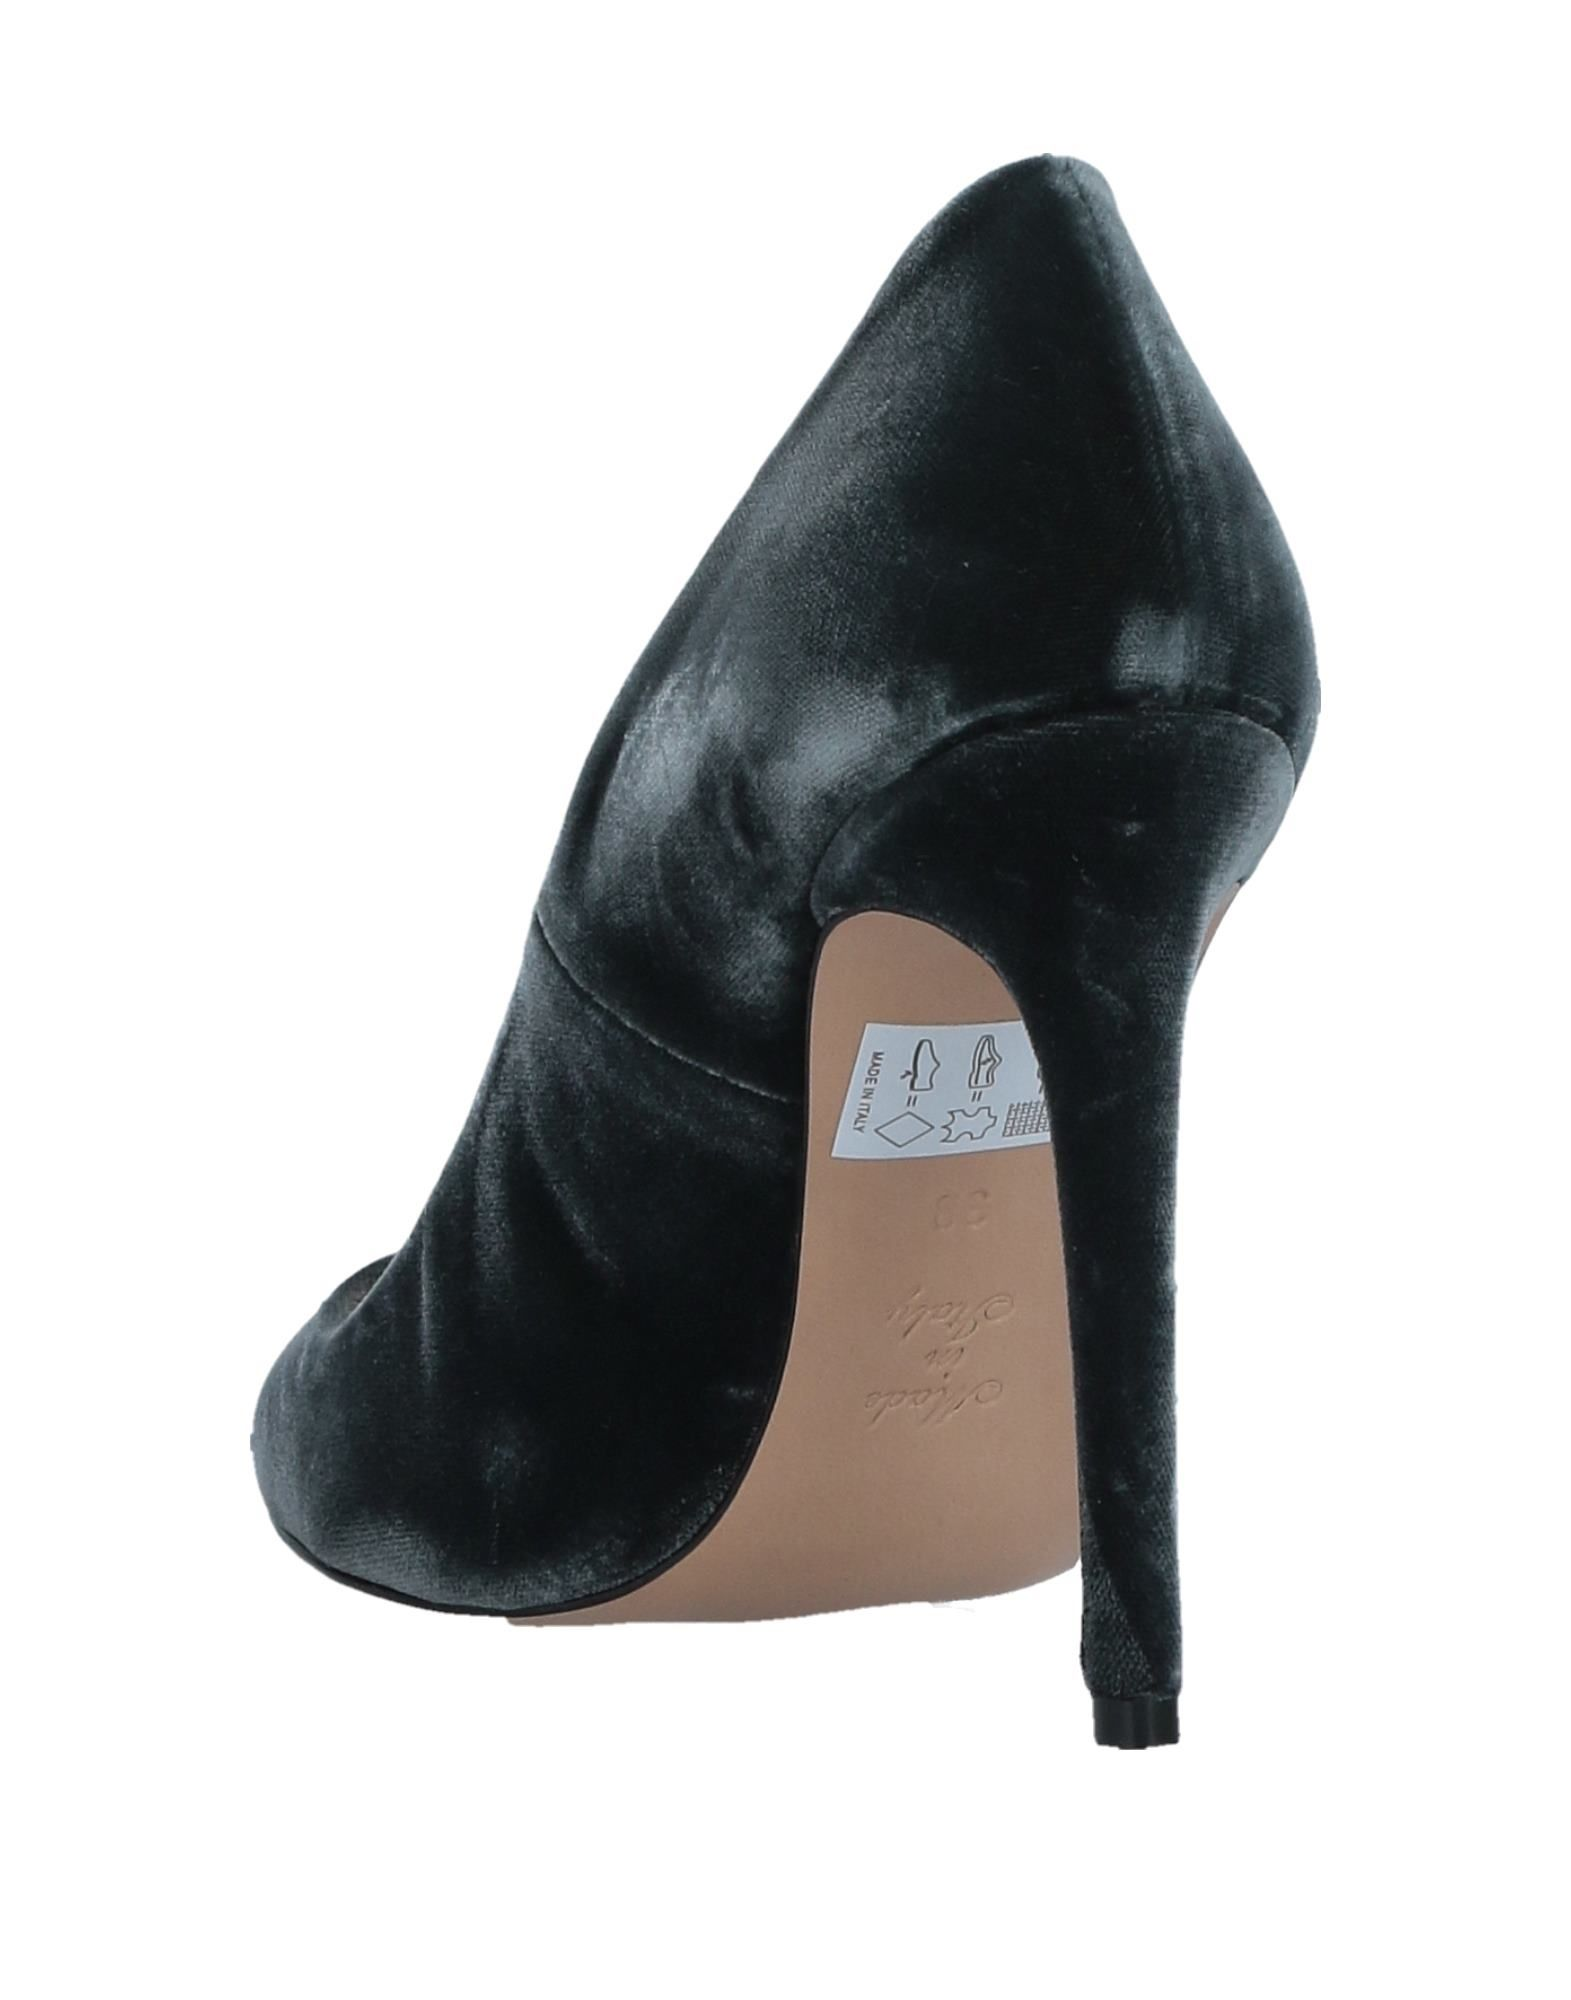 Ovye' By Gute Cristina Lucchi Pumps Damen  11537000KJ Gute By Qualität beliebte Schuhe 6b39e6